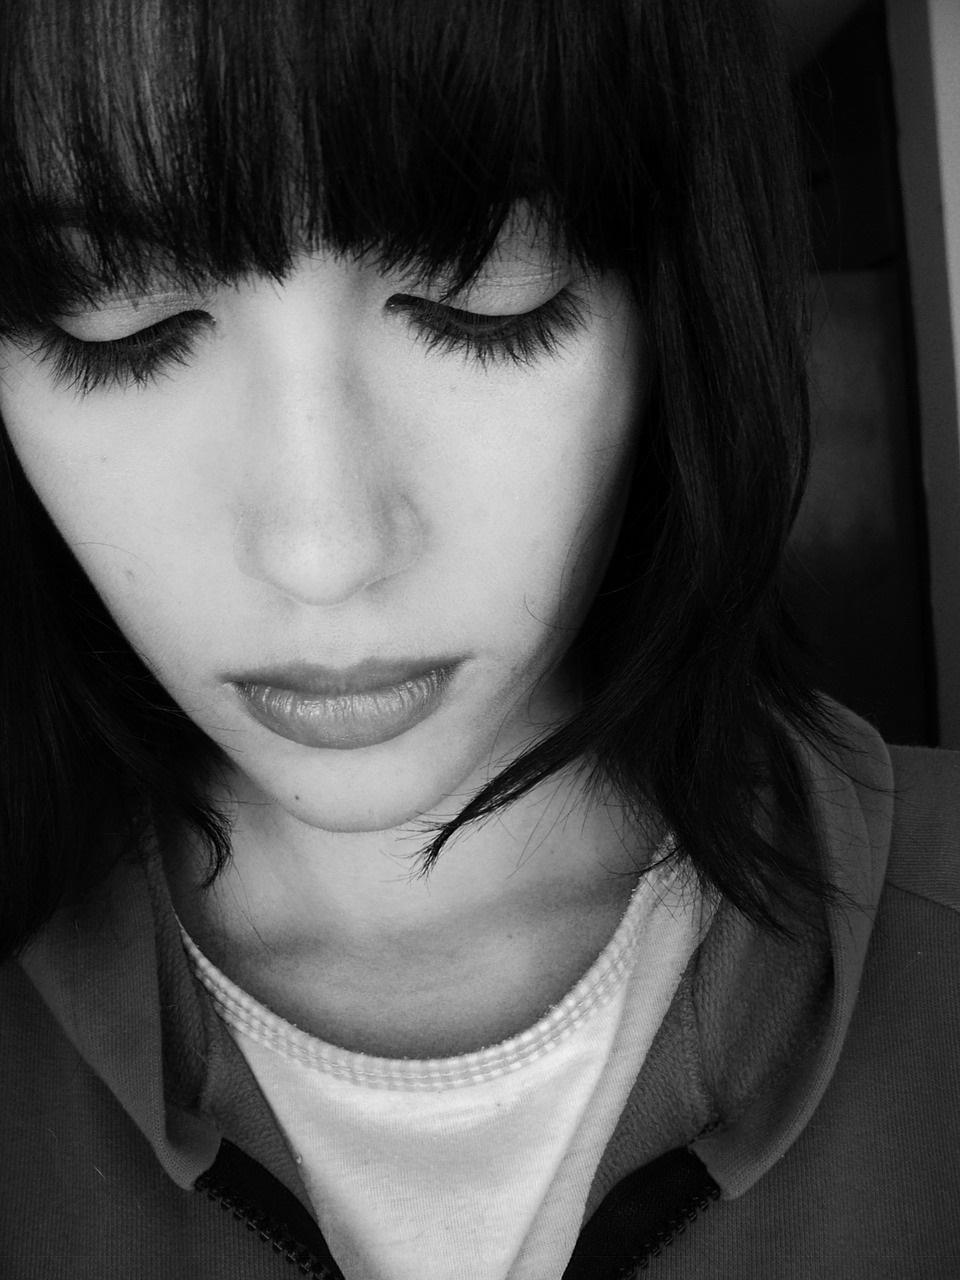 sad demeanour on woman face